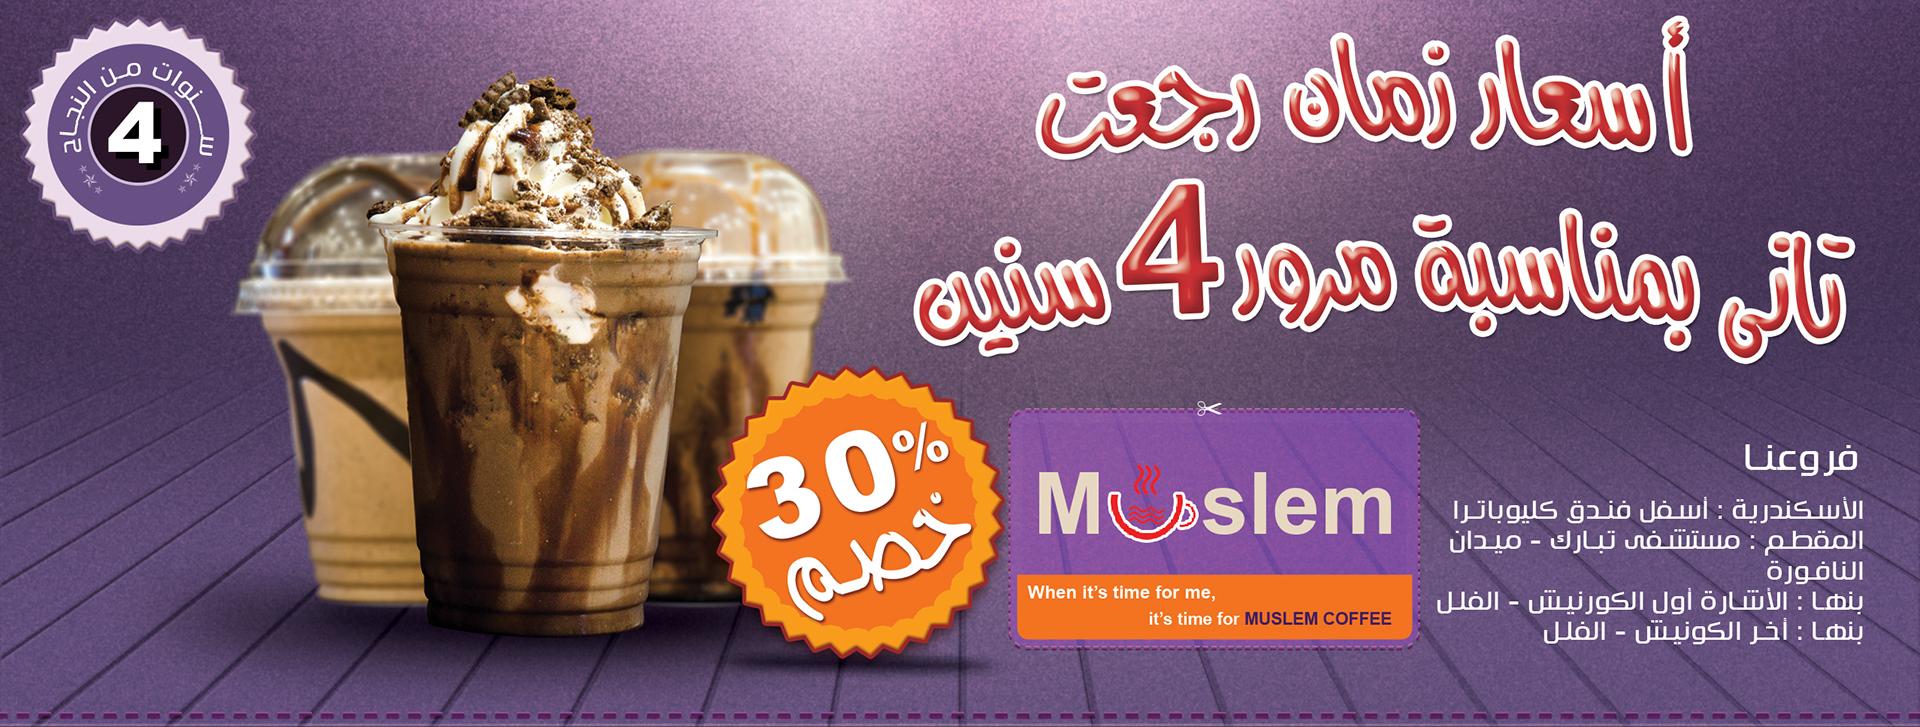 Muslem Coffee Facebook ADS on Behance